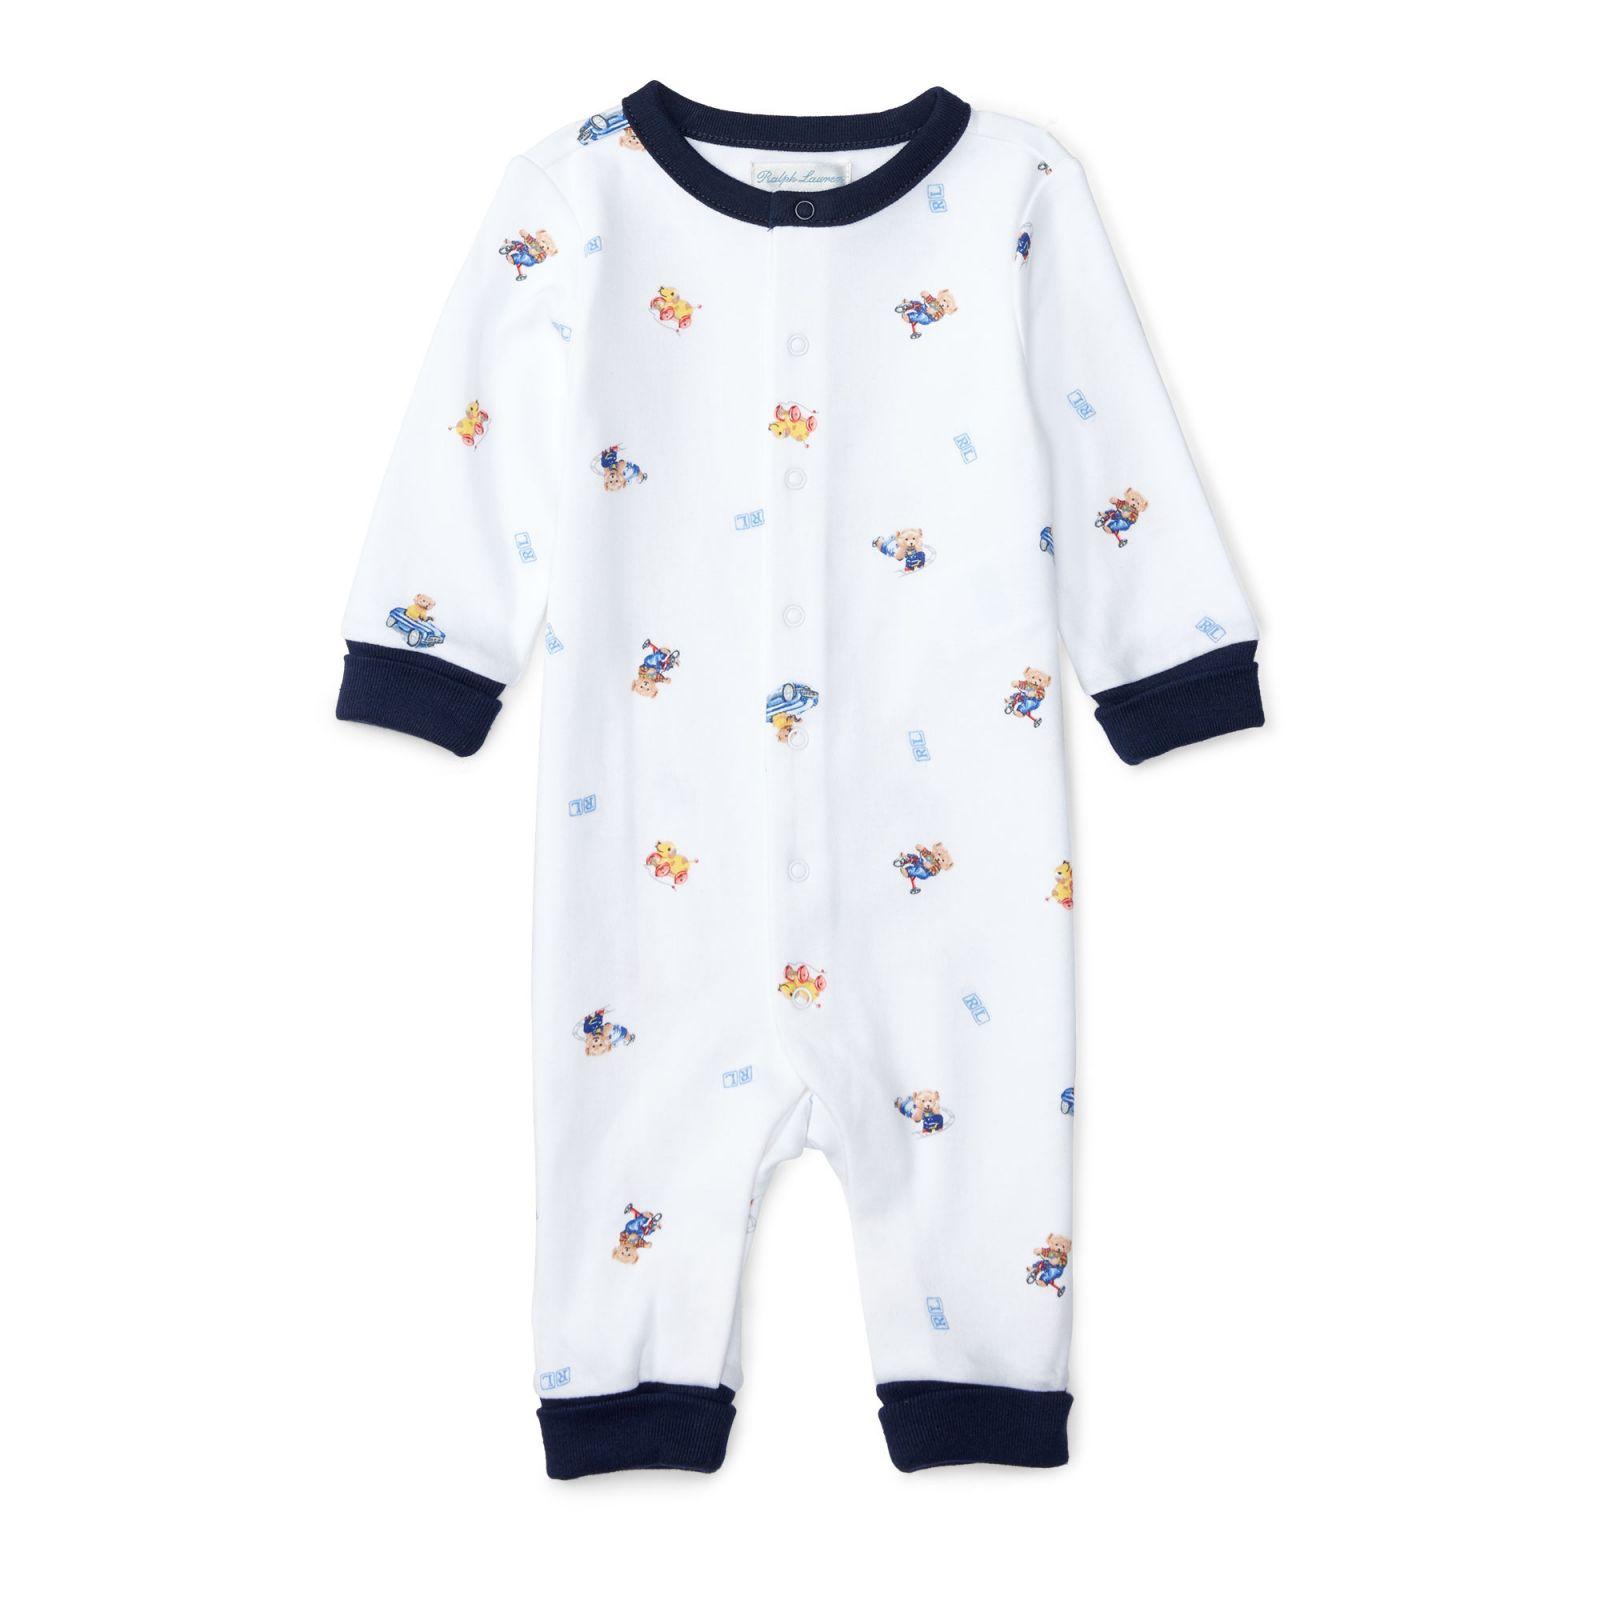 Ralph Lauren oblečení pro miminko Polo Bear Cotton Coverall